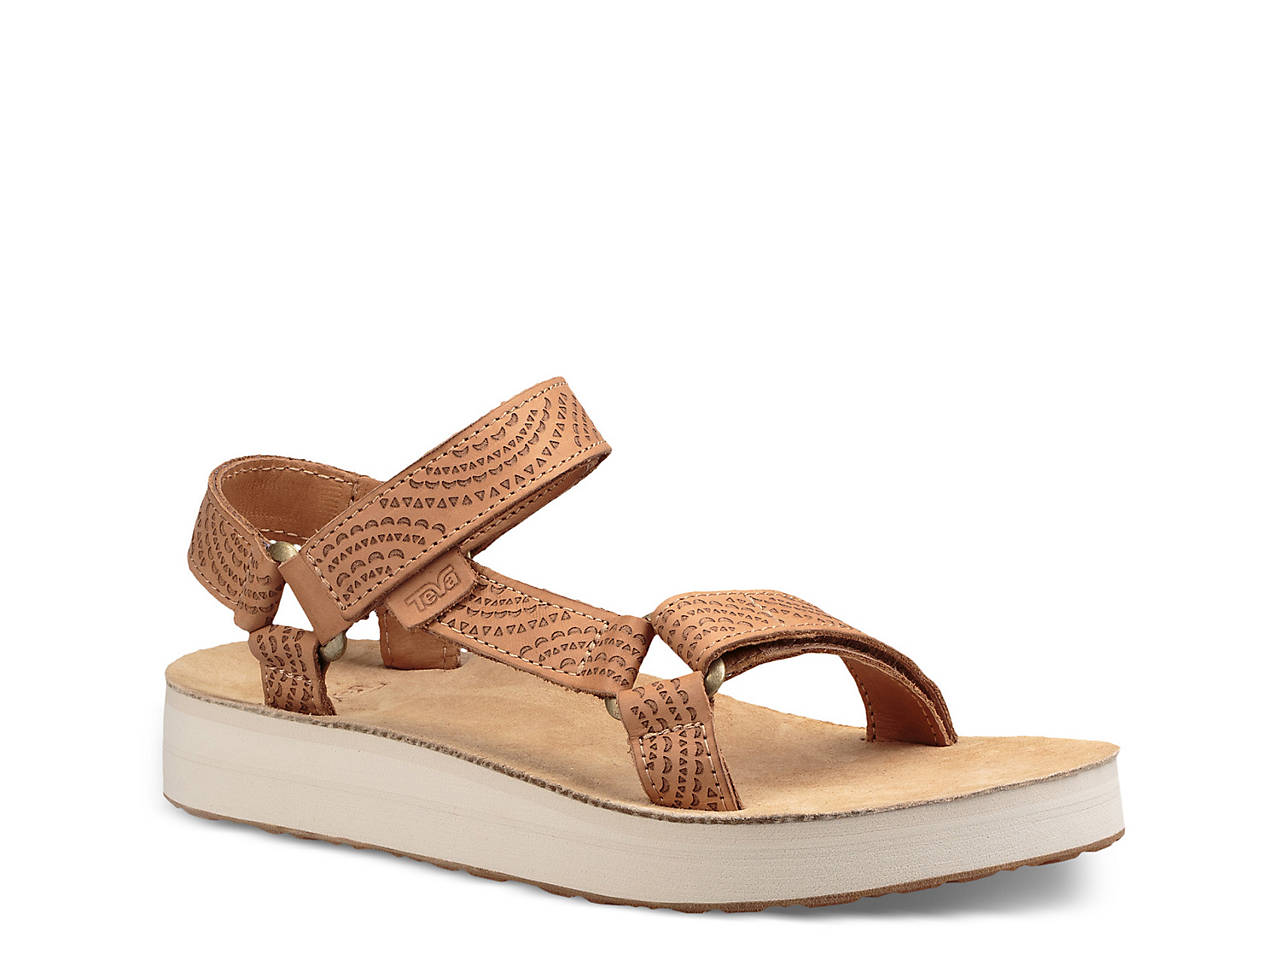 15527c8465f2 Teva Midform Universal Geometric Wedge Sandal Women s Shoes